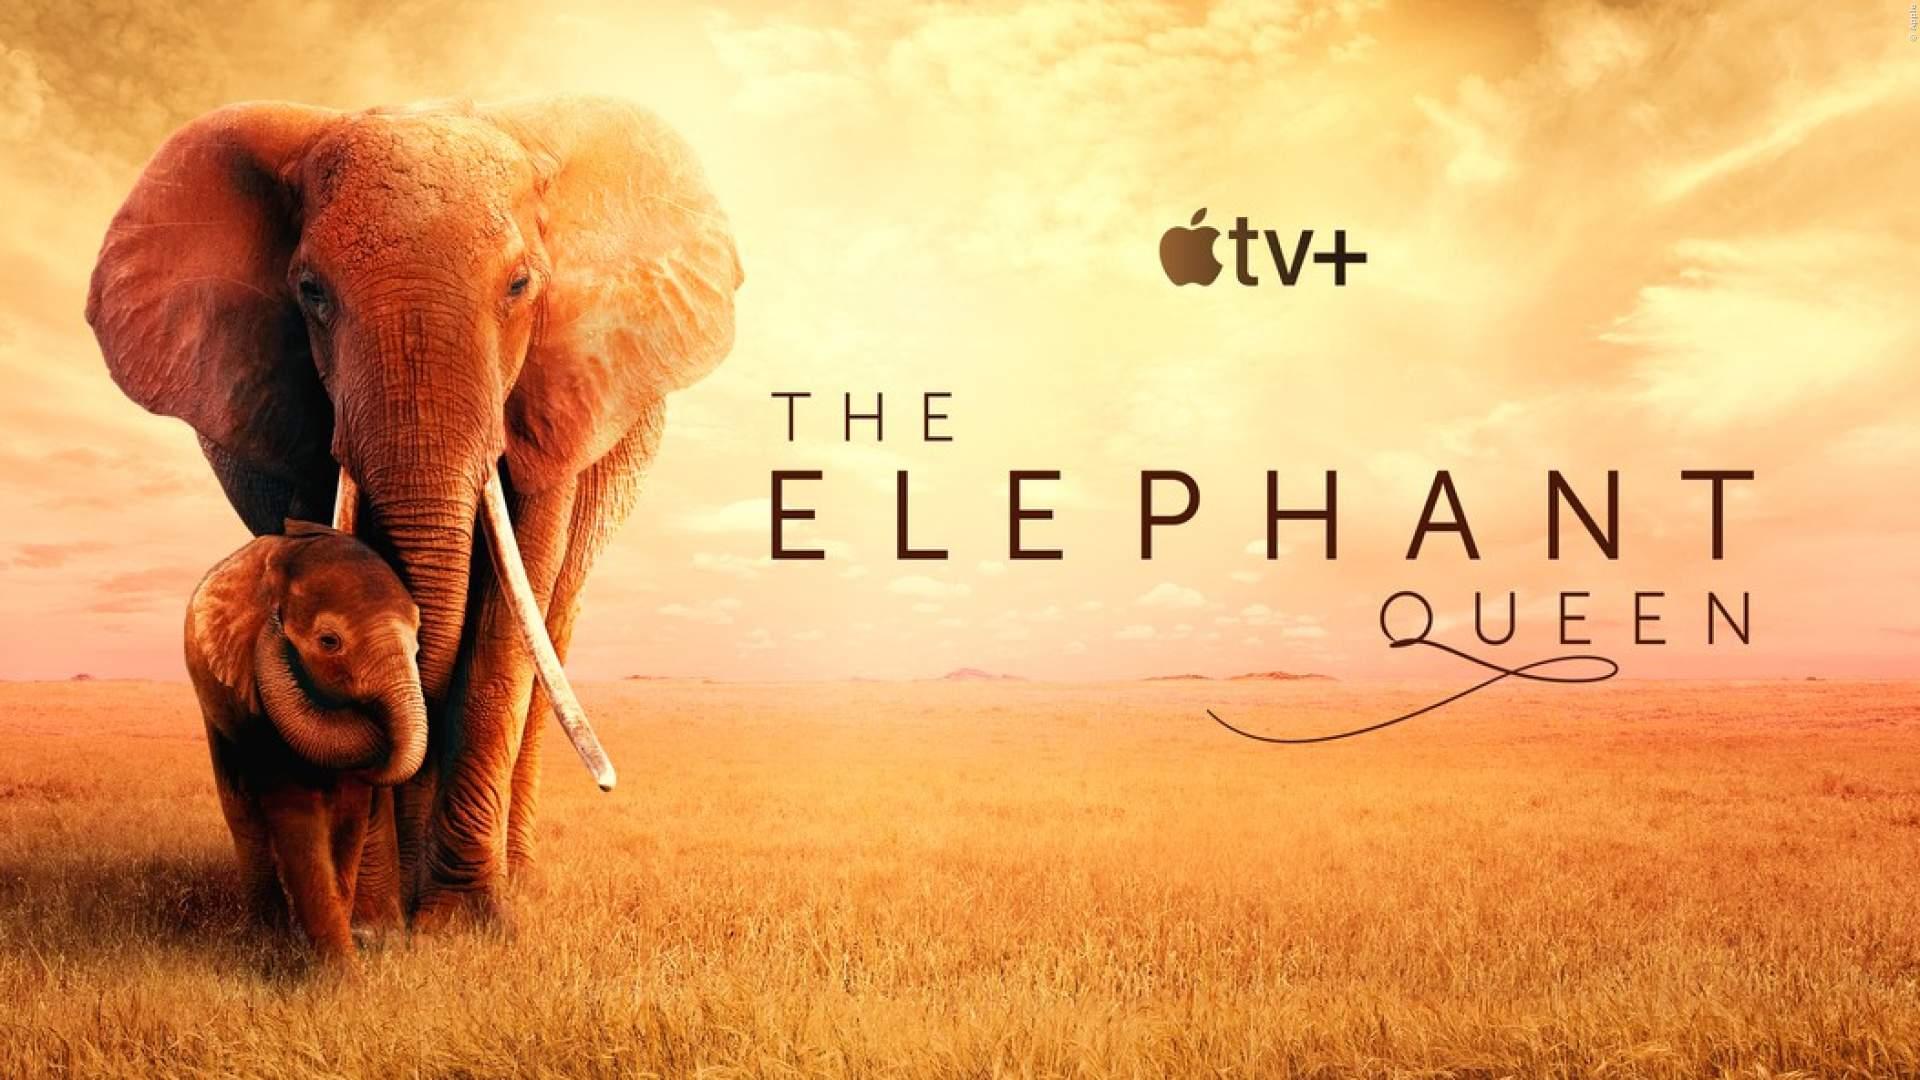 APPLE TV+: Spannende Tier-Doku aus dem Herzen Afrikas